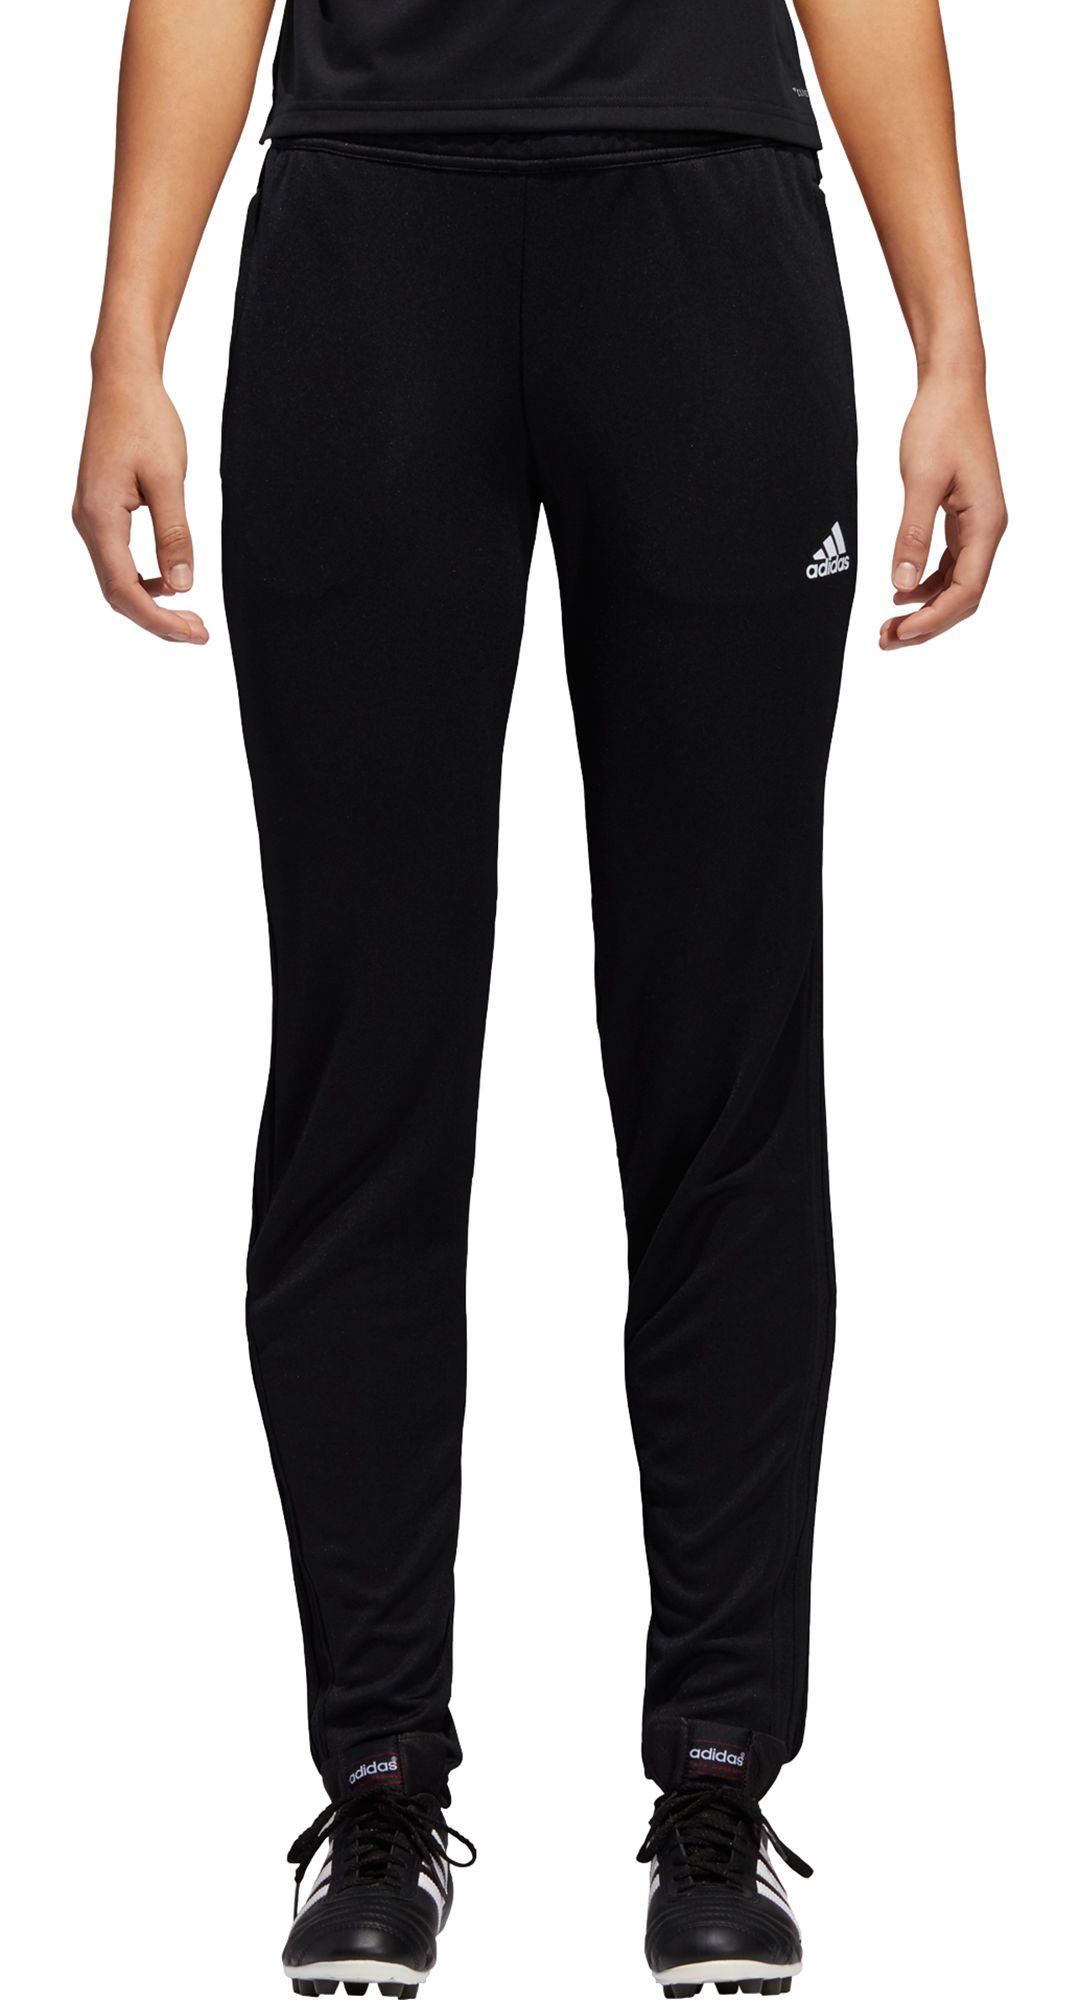 adidas Women's Condivo 18 Training Pants